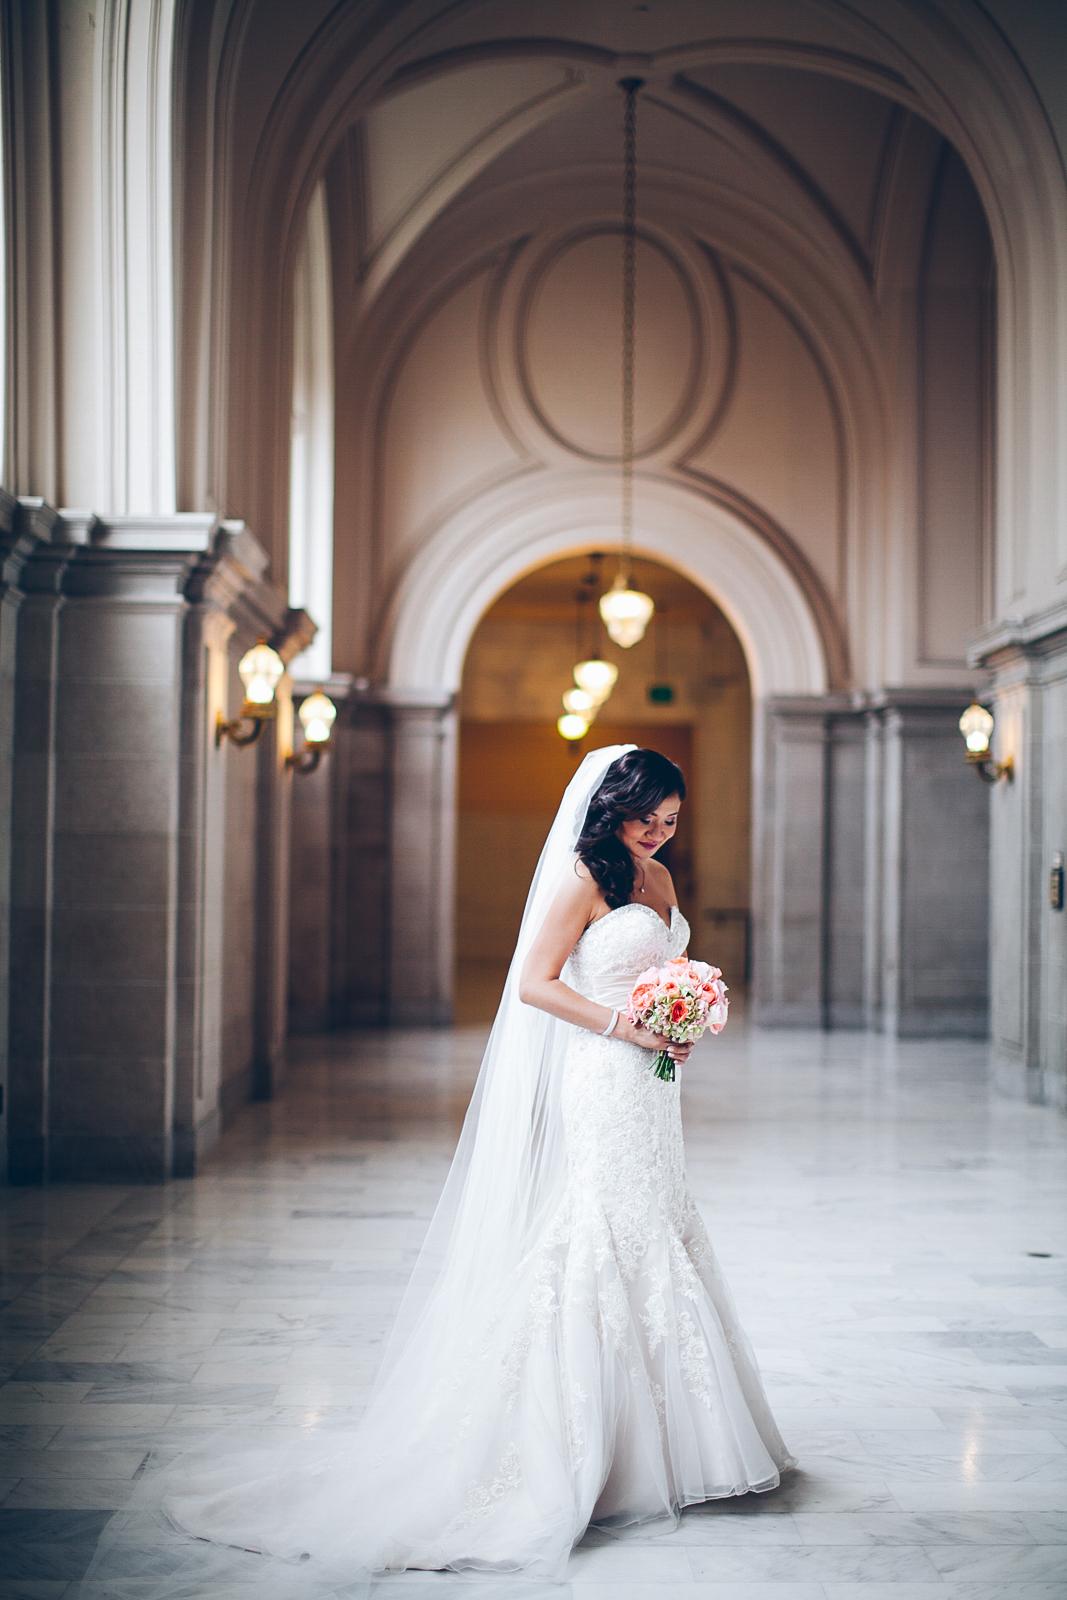 San_francisco_city_hall_wedding_photography_meegan_travis_ebony_siovhan_bokeh_photography_38.jpg